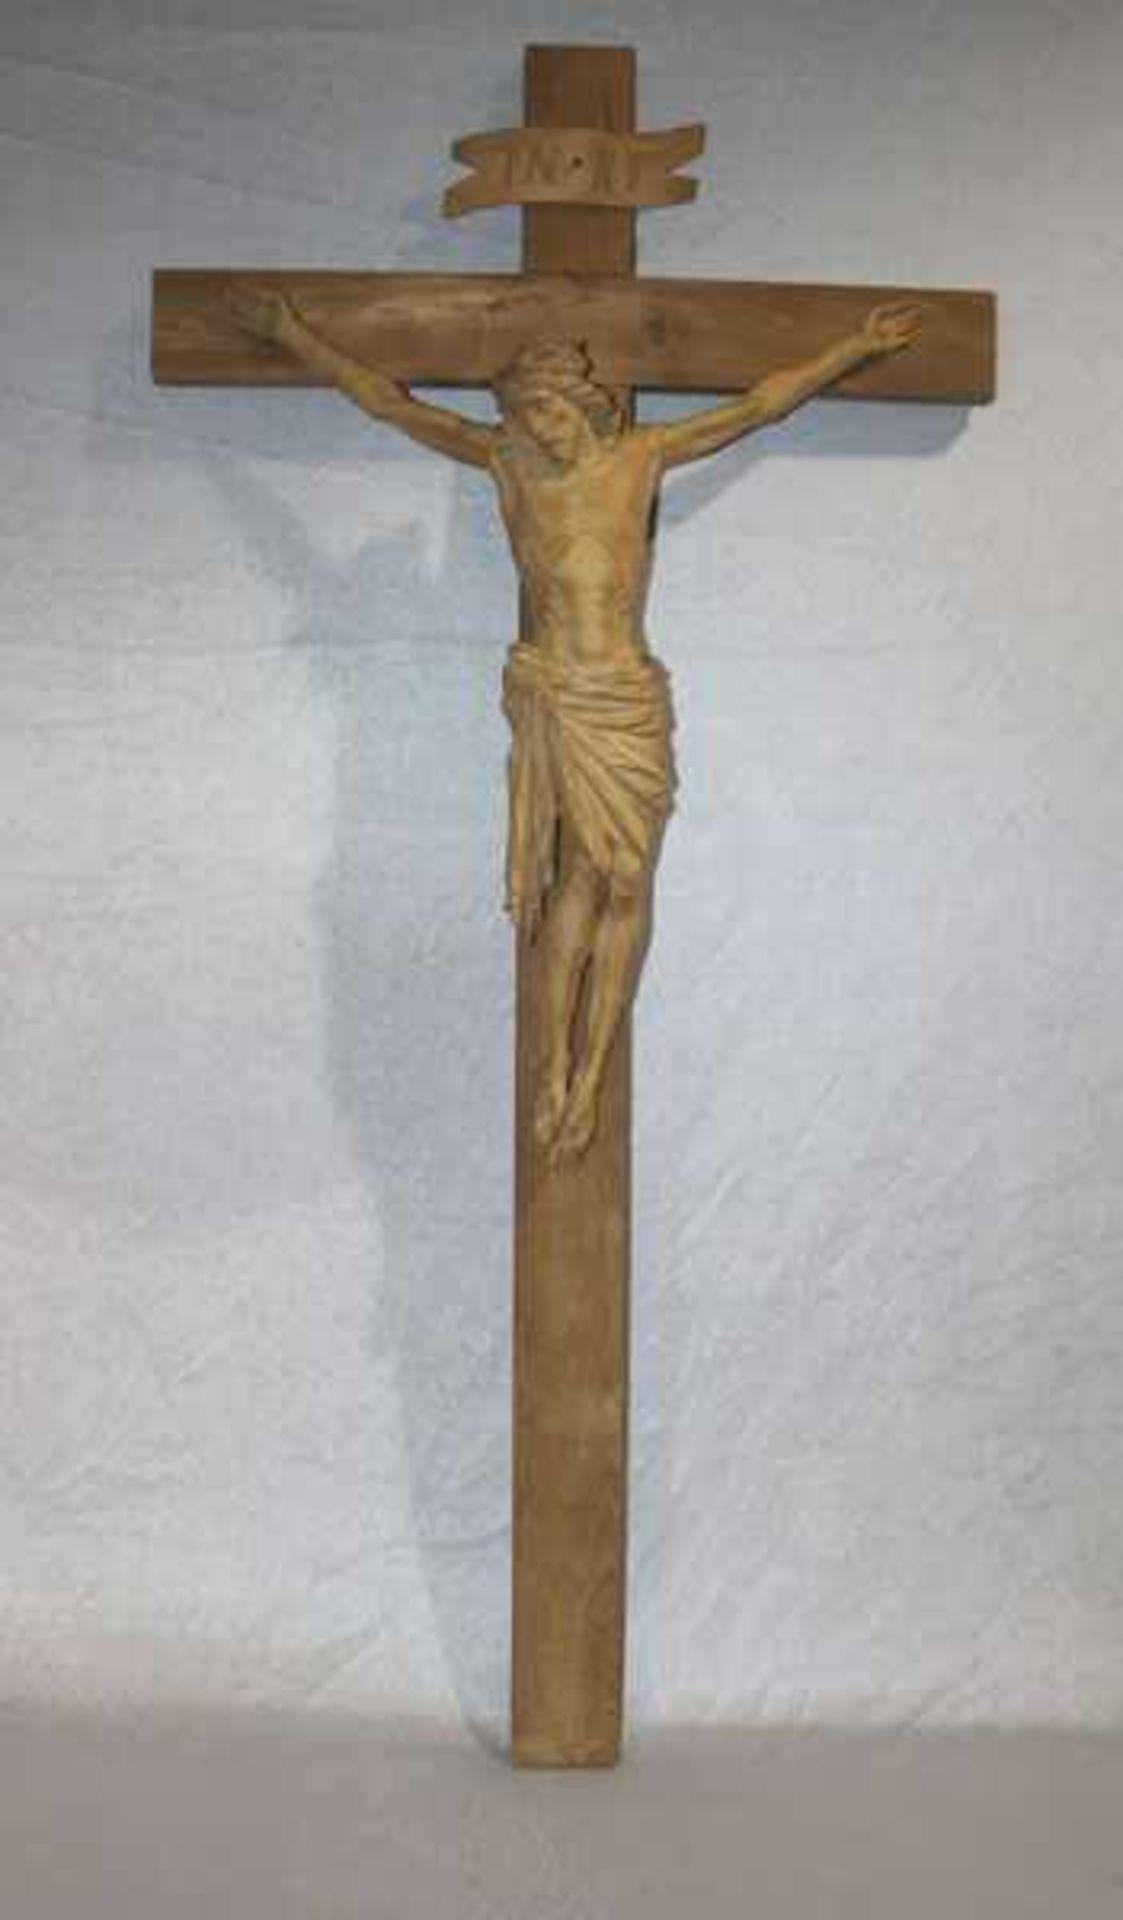 Los 675 - Holz Kreuz mit Korpus Christi, wohl Oberammergau, H 107 cm, B 52 cm